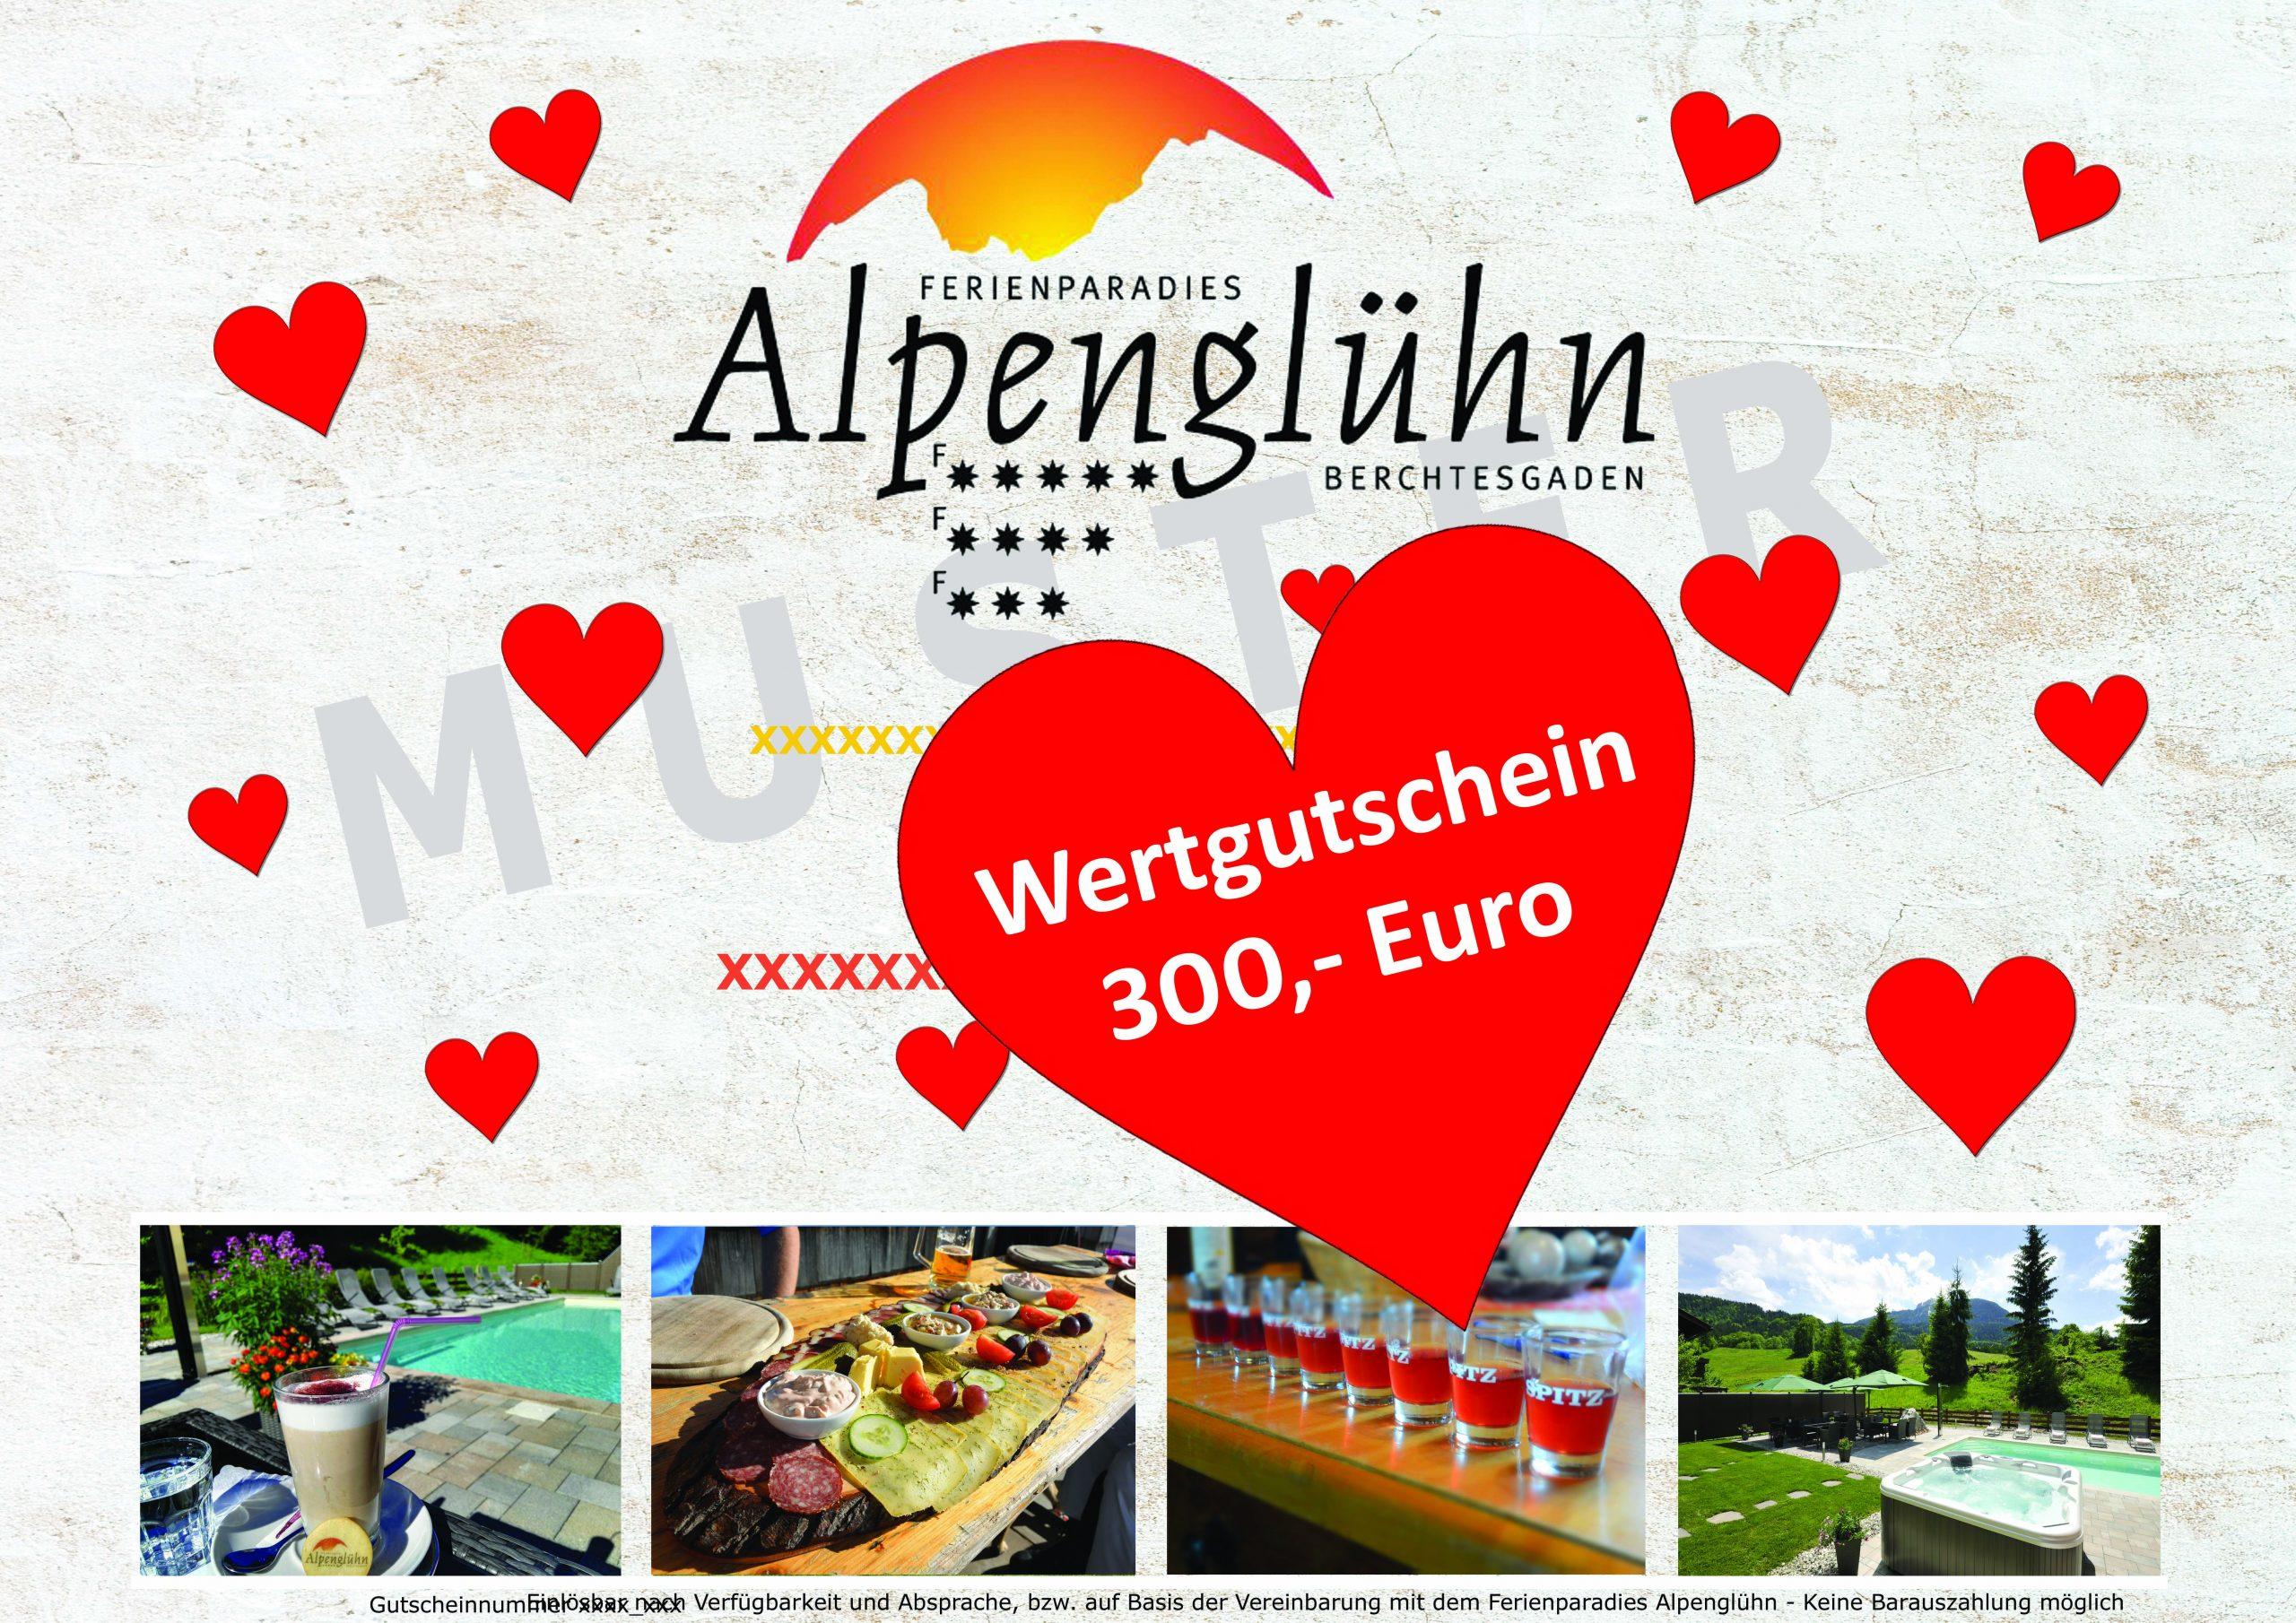 (c)be-outdoor.de_Muttertagsgewinnspiel_Ferienparadies_Alpenglühn